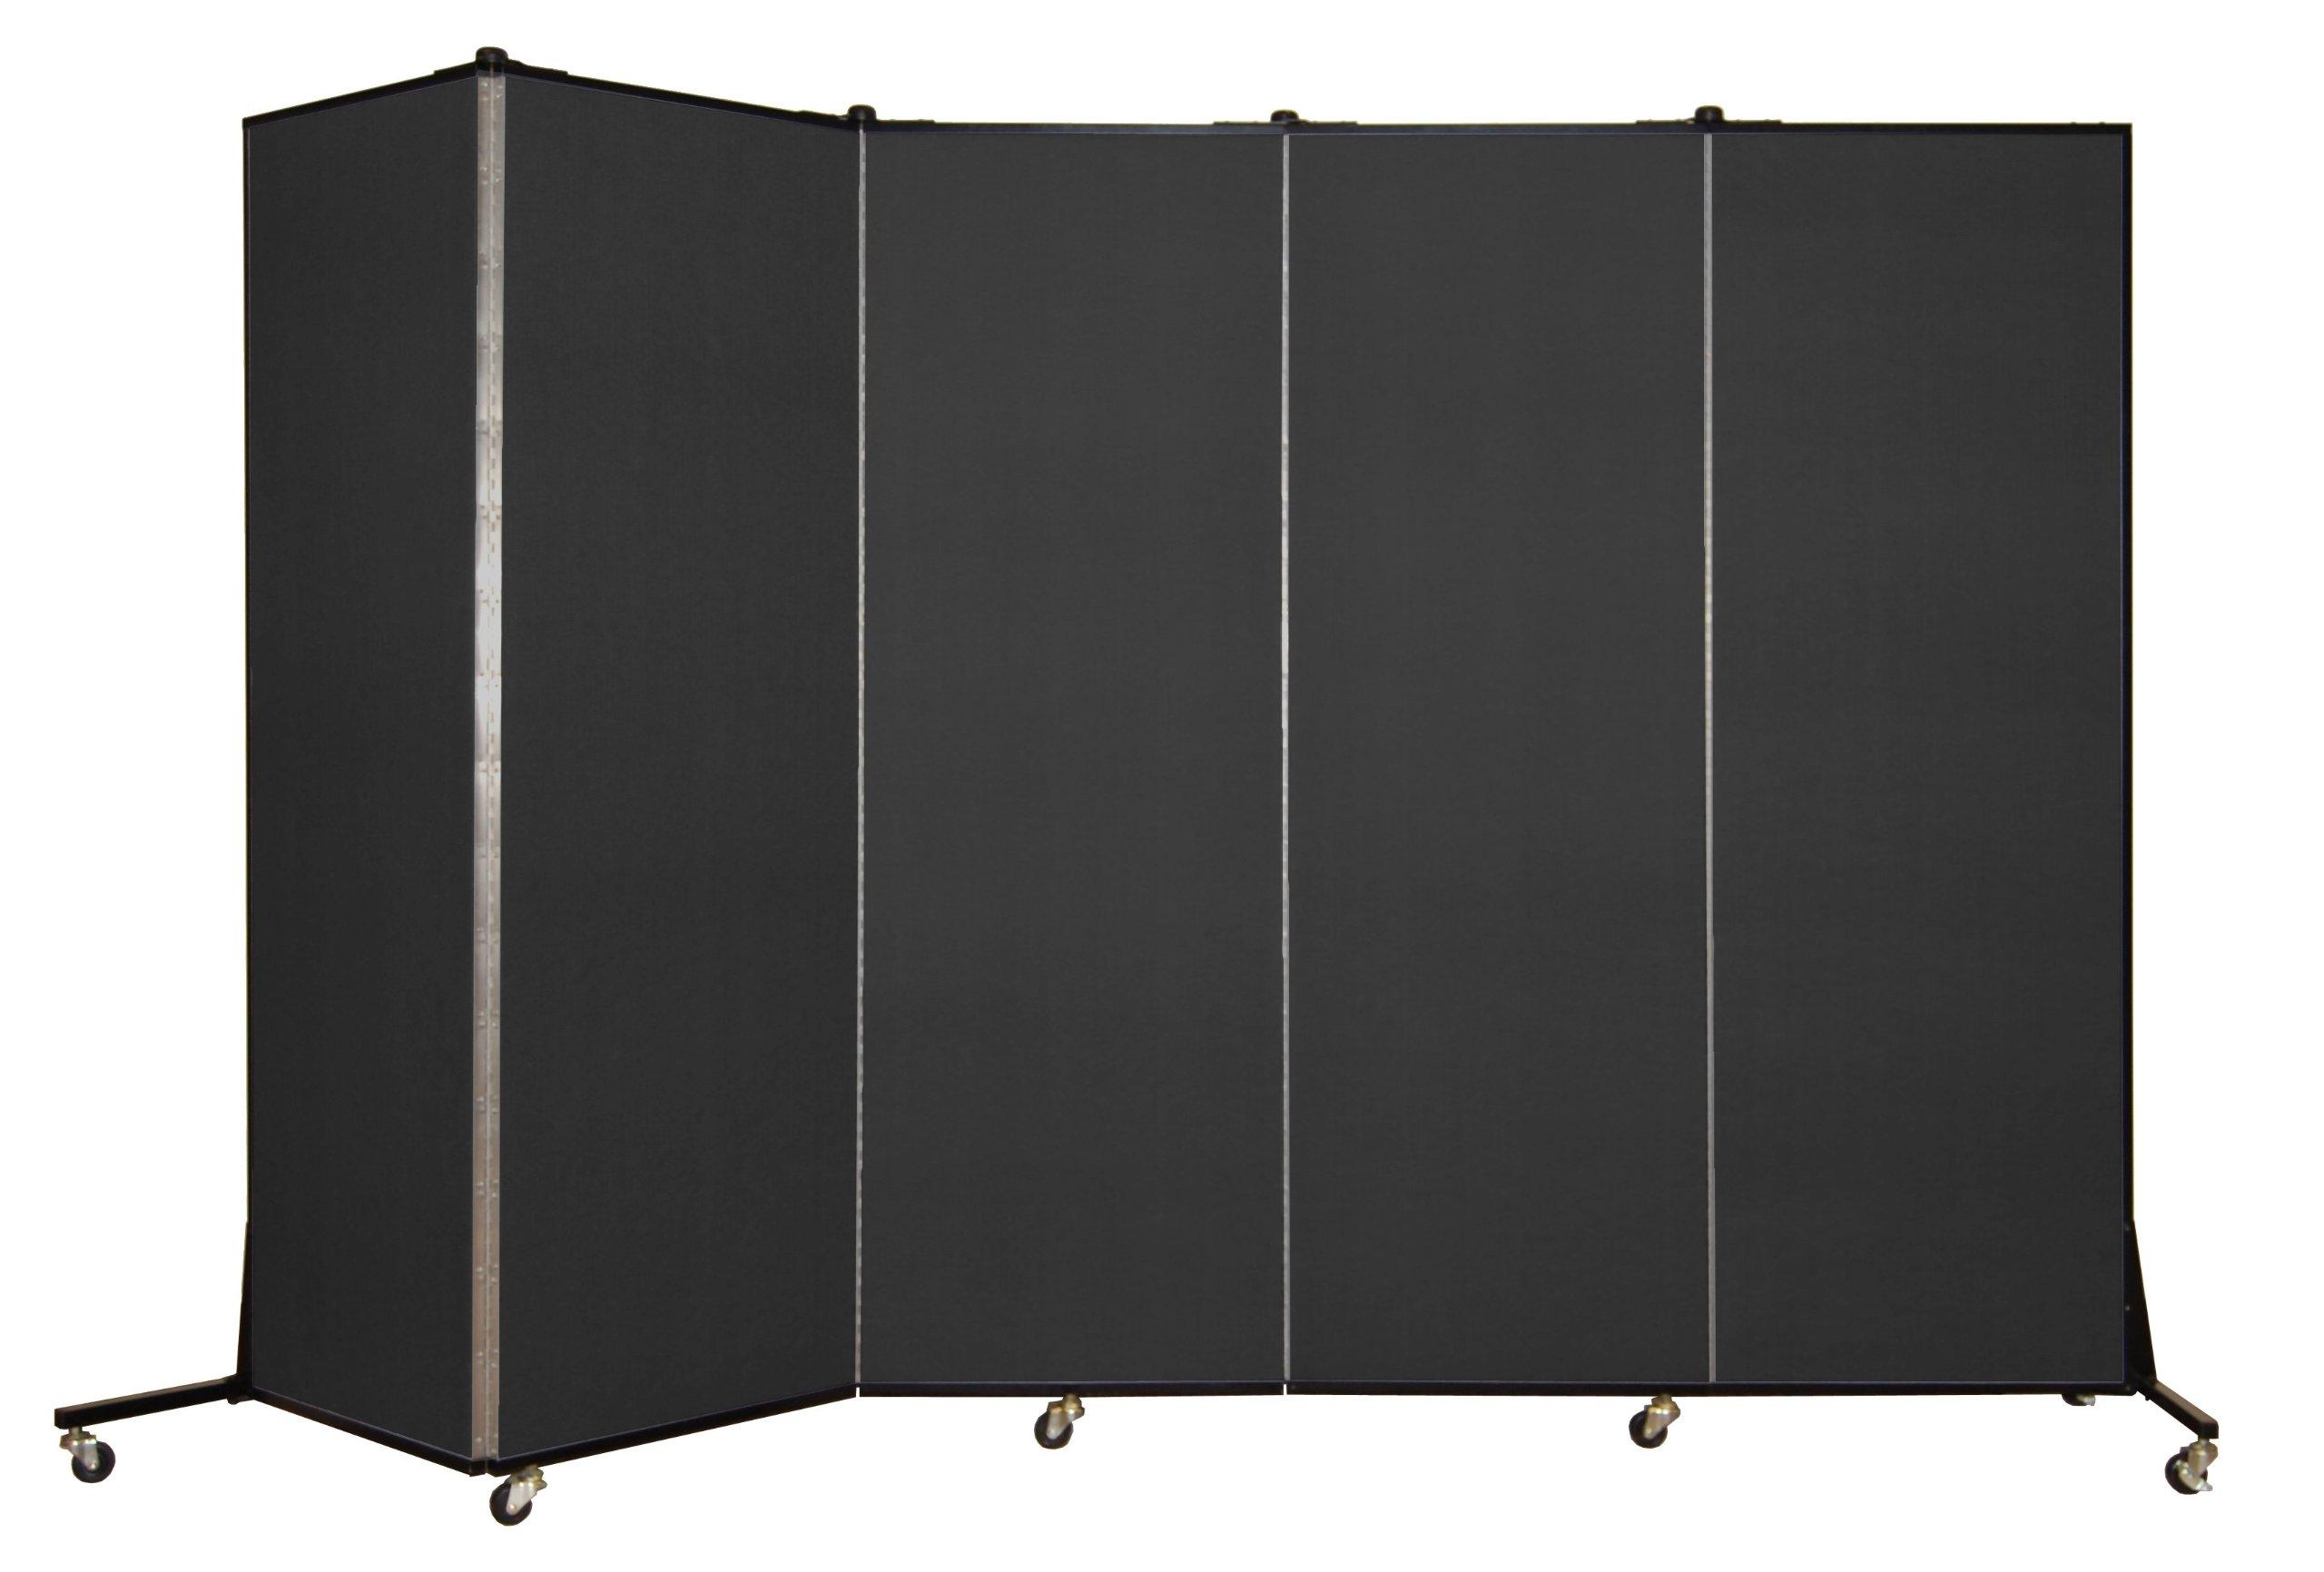 Screenflex BFSL685-DX Light Duty Portable Room Divider, 5 Panels